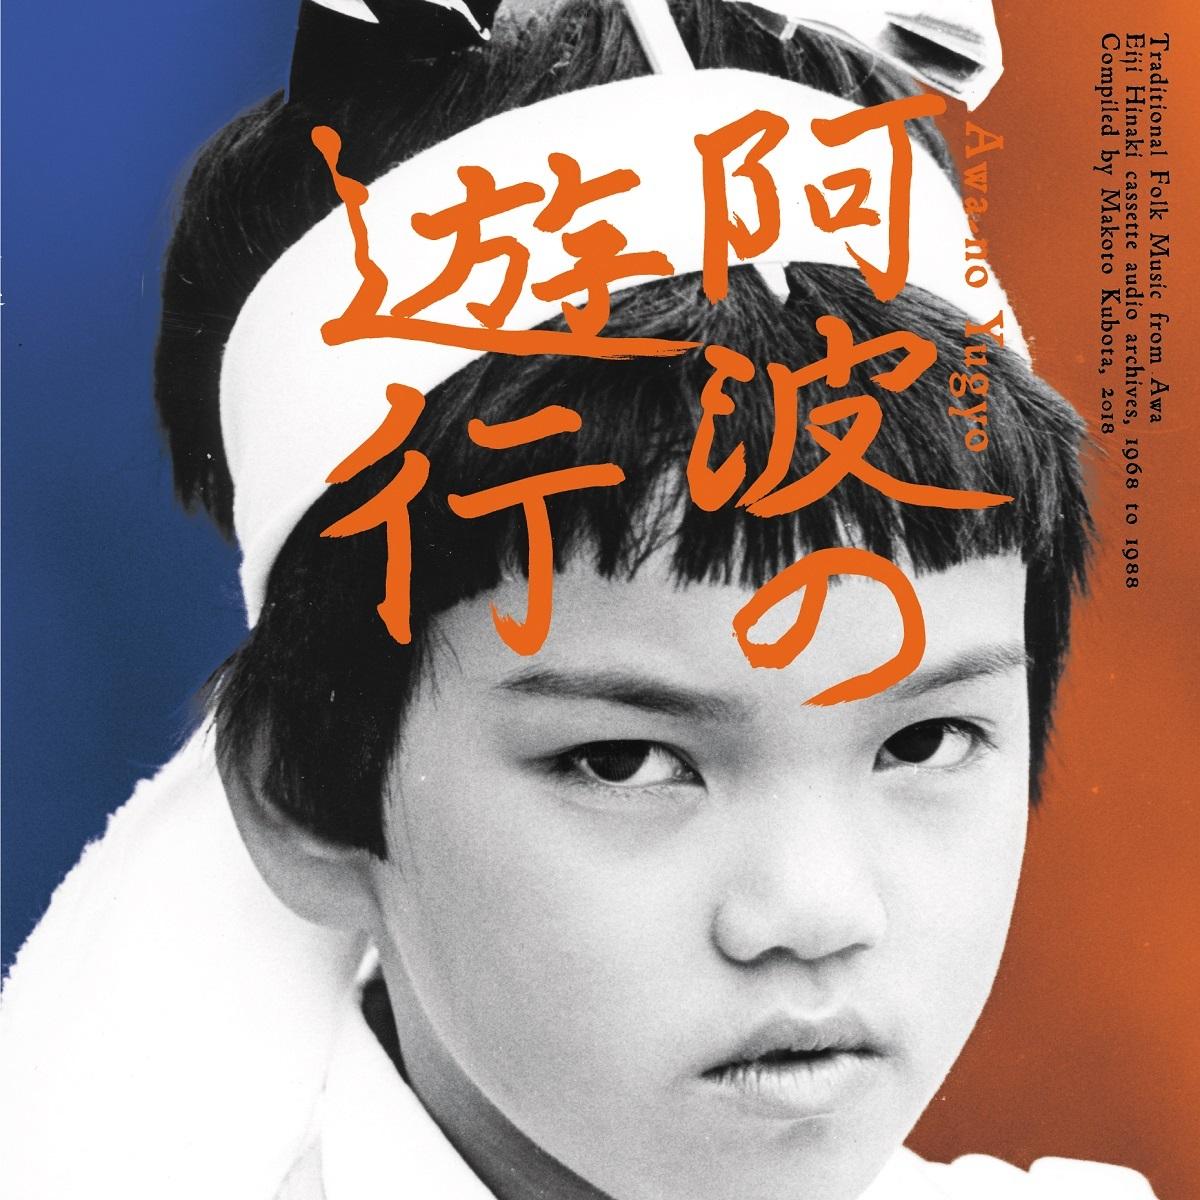 写真・図版 : CD「阿波の遊行」